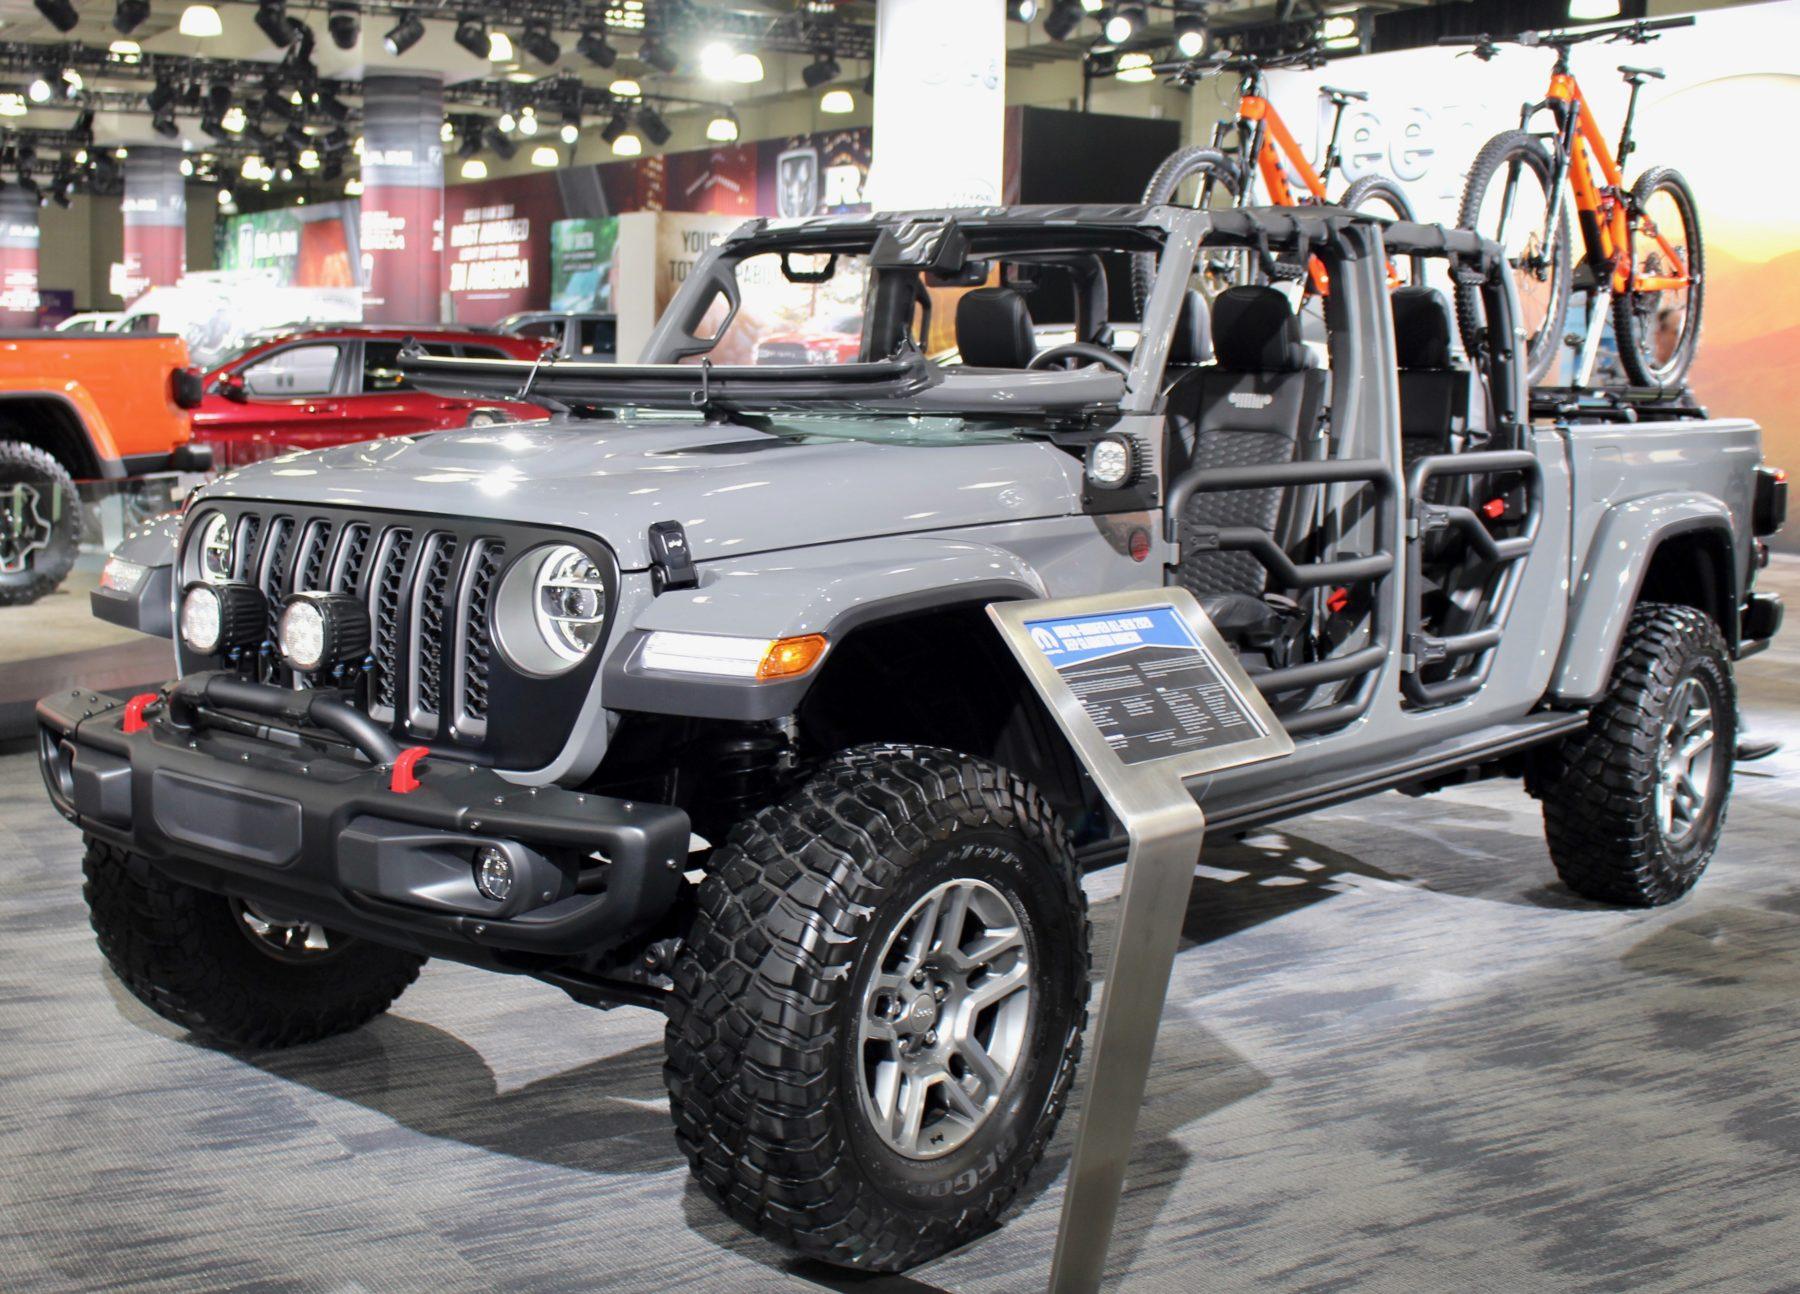 Jeep Gladiator with Mopar parts